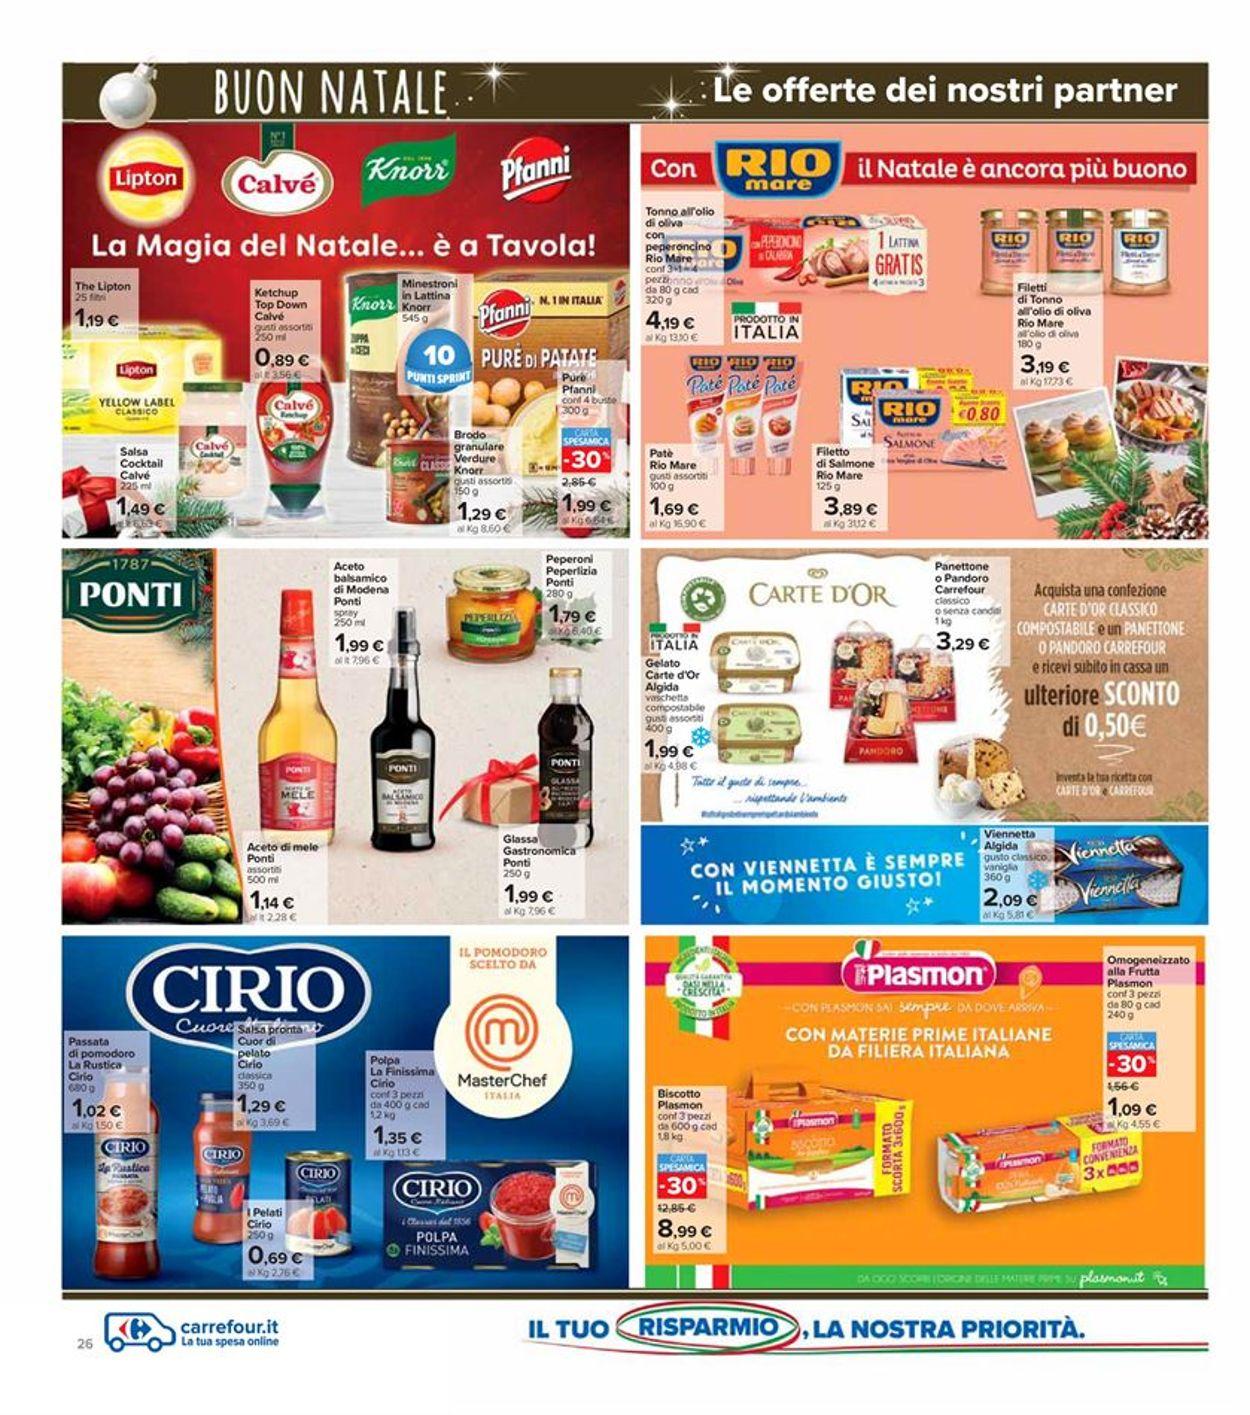 Volantino Carrefour - Natale 2020 - Offerte 14/12-27/12/2020 (Pagina 26)